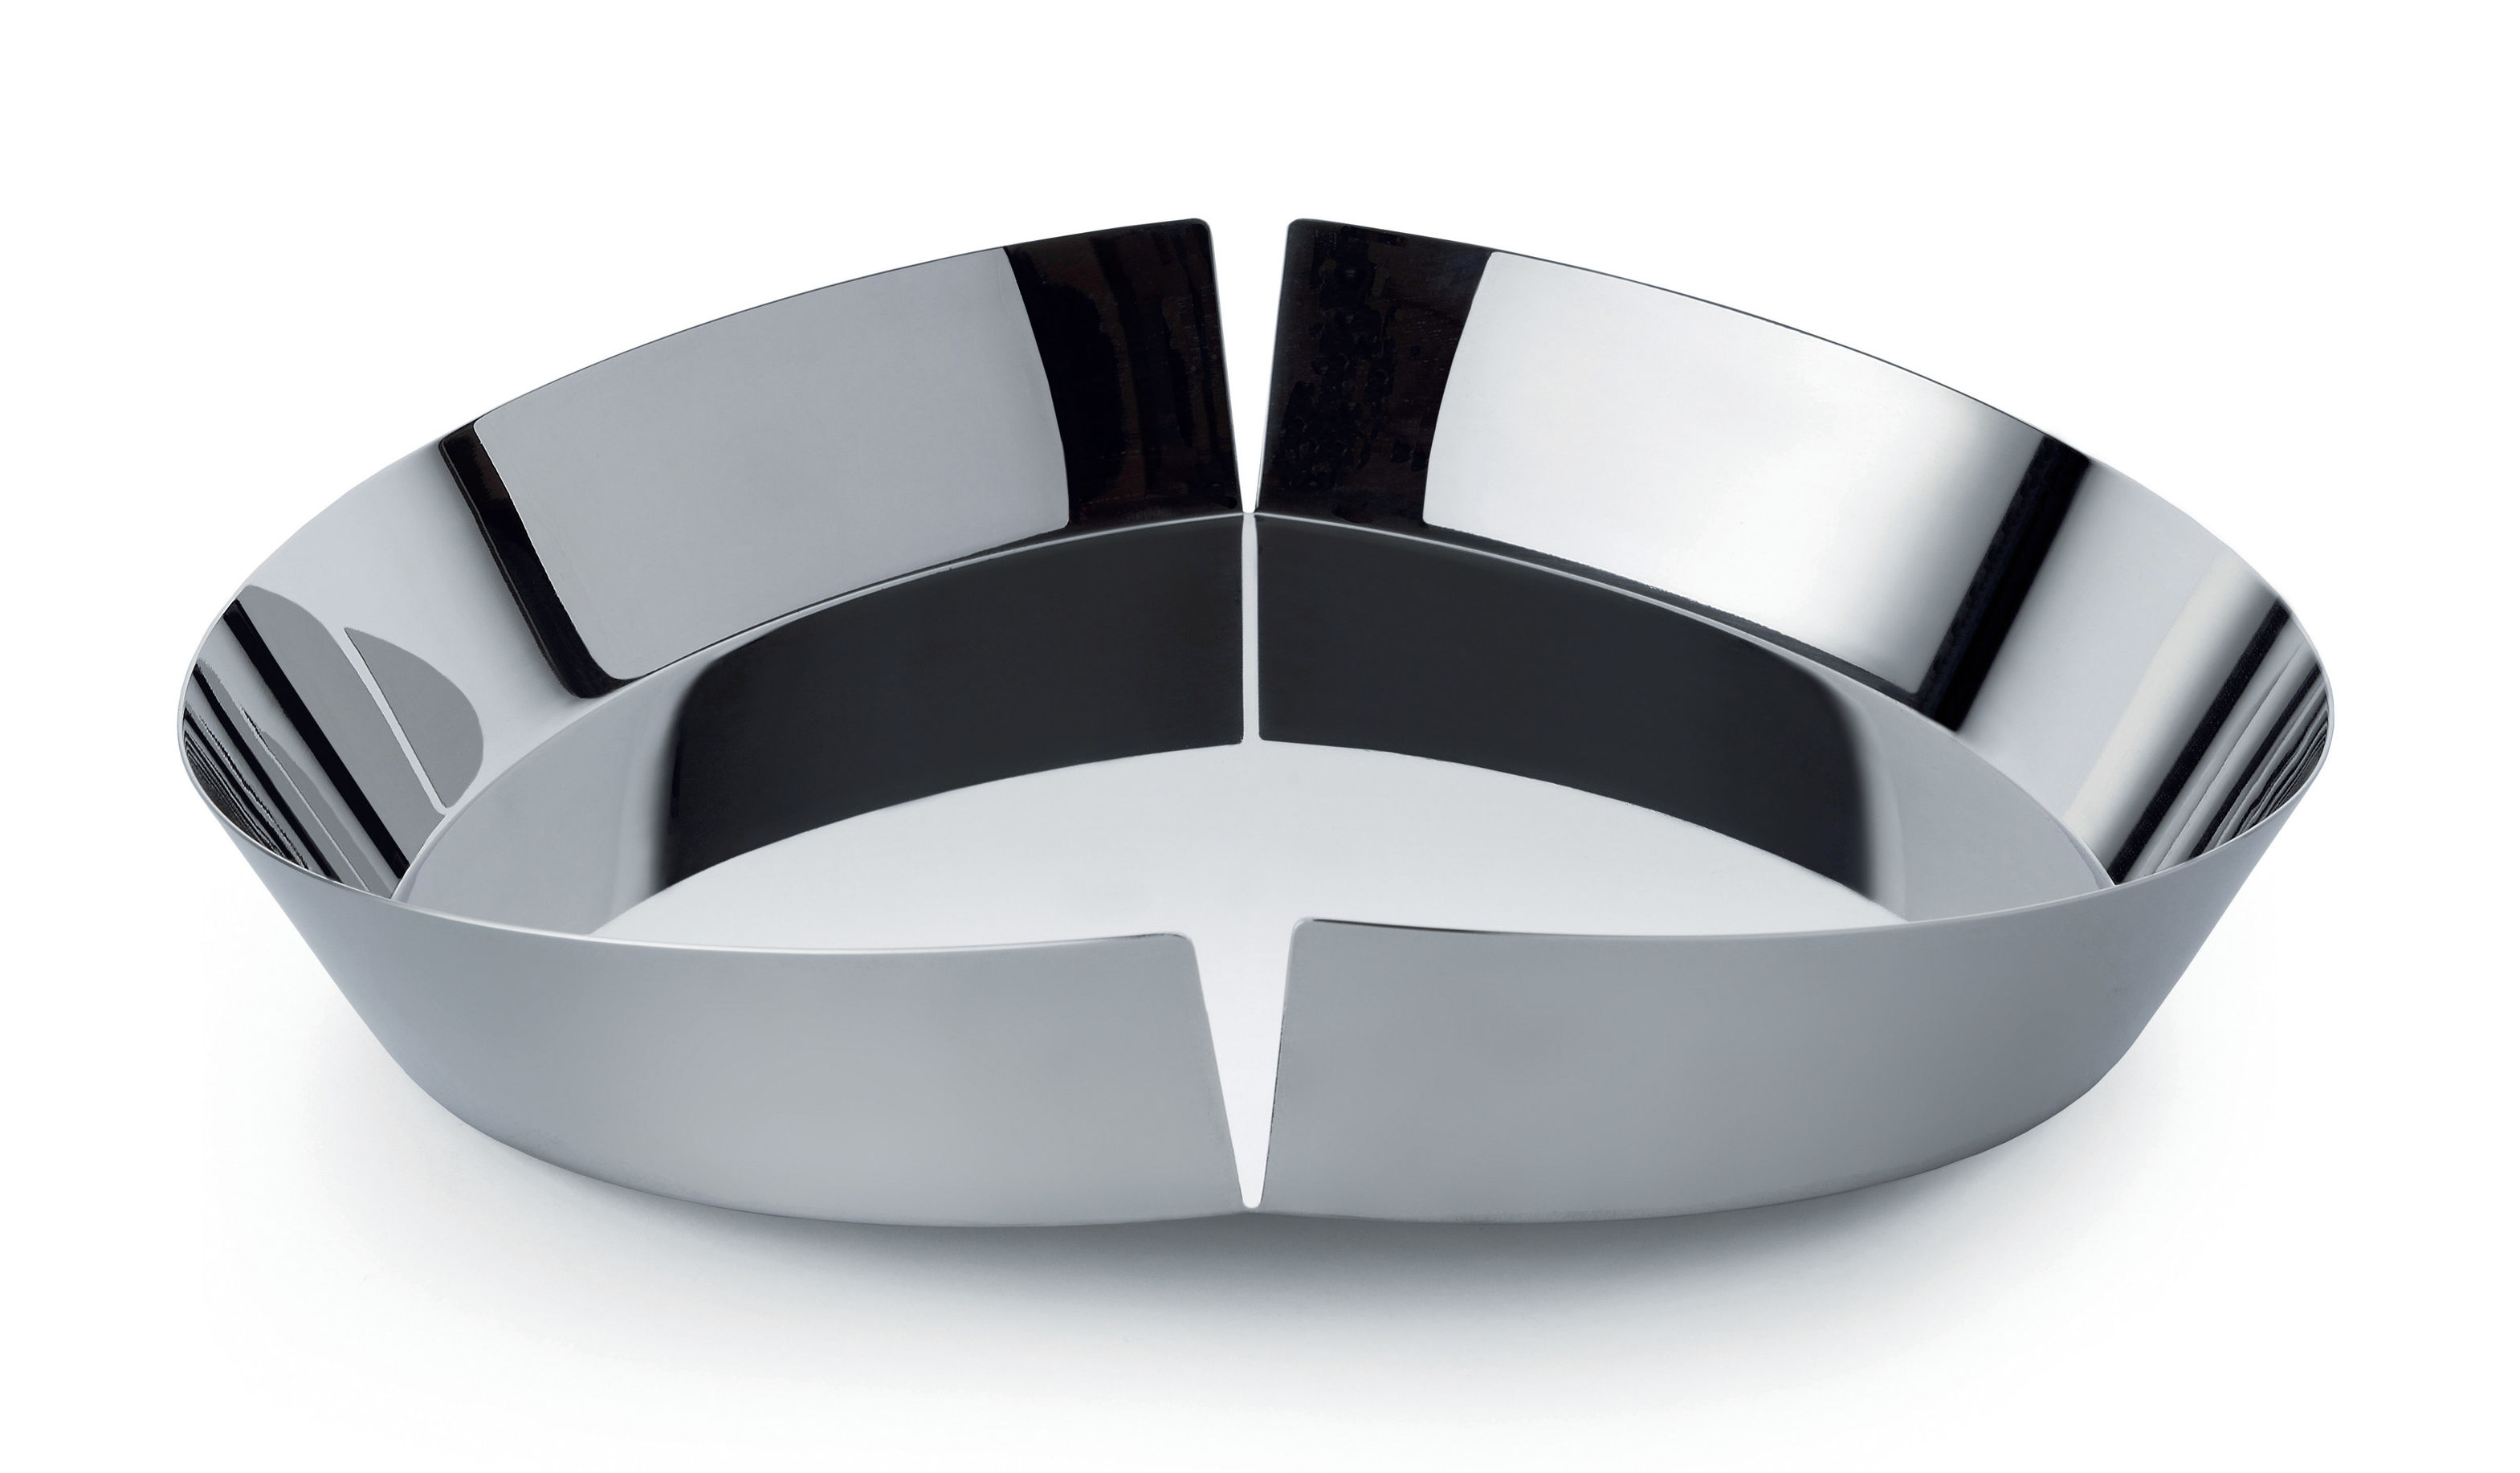 Arts de la table - Saladiers, coupes et bols - Corbeille à fruits Broken Bowl / Ø 31 cm - Alessi - Acier brillant - Acier inoxydable 18/10